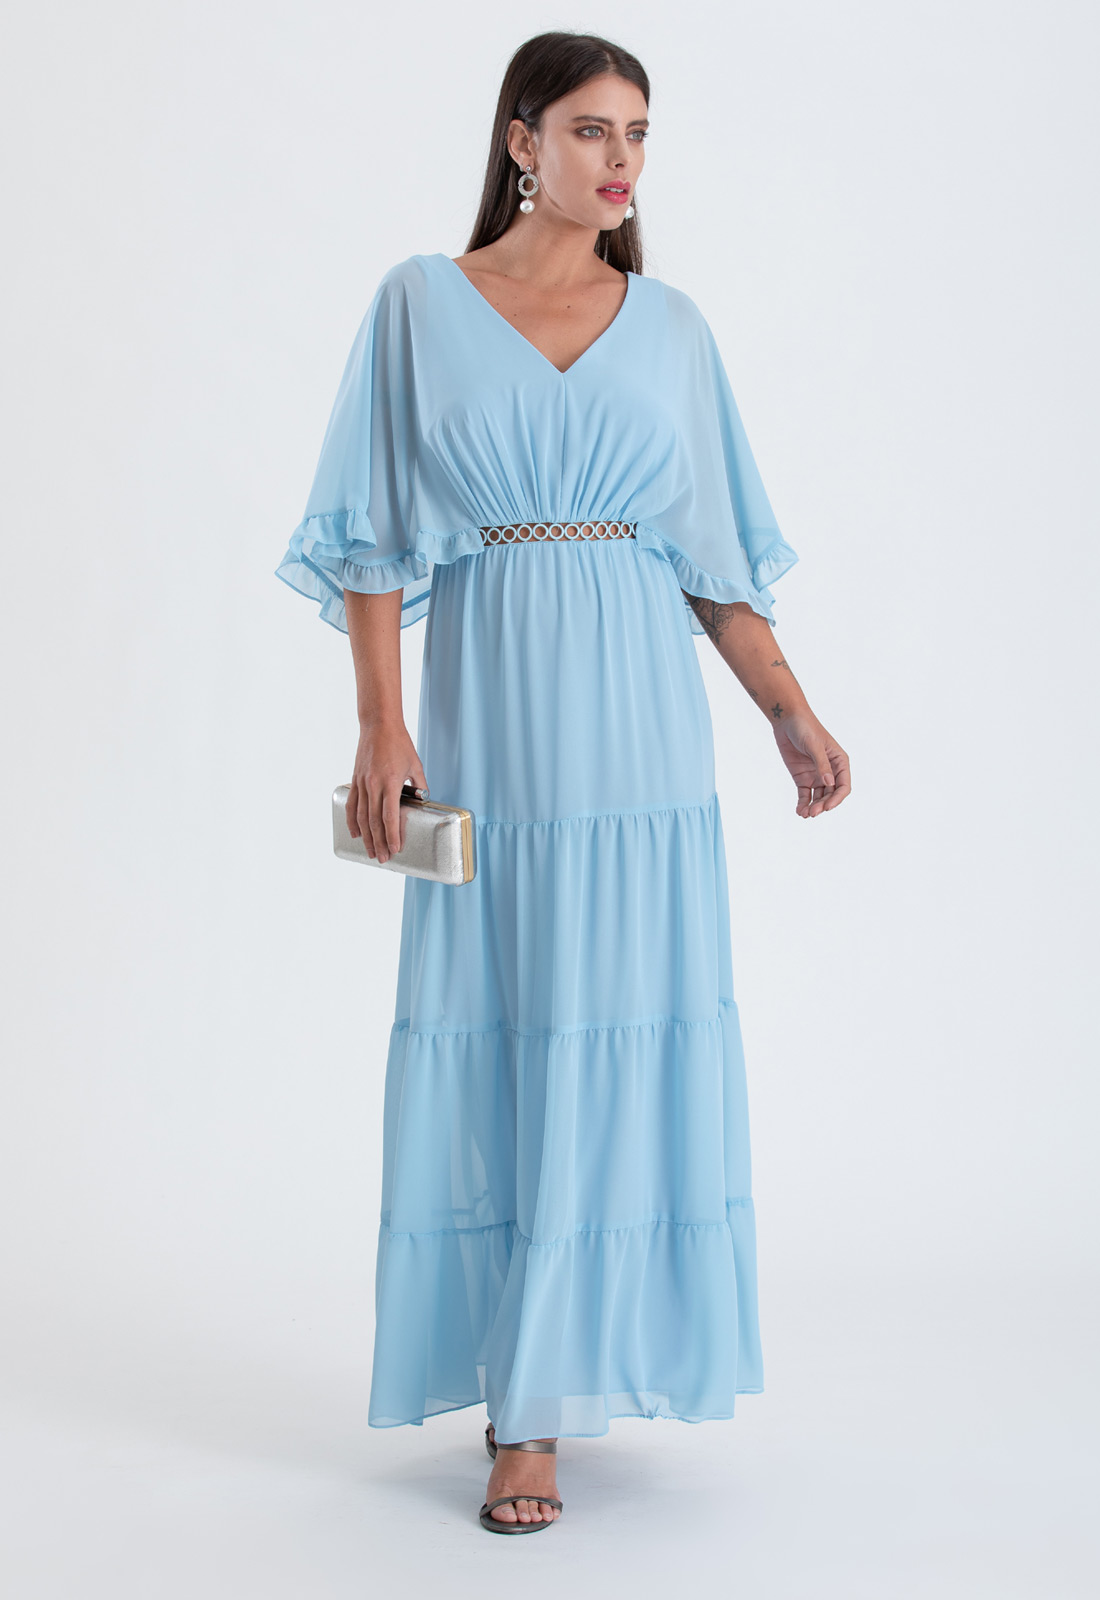 Vestido maxi serenity com detalhe guippir Ref. 2647